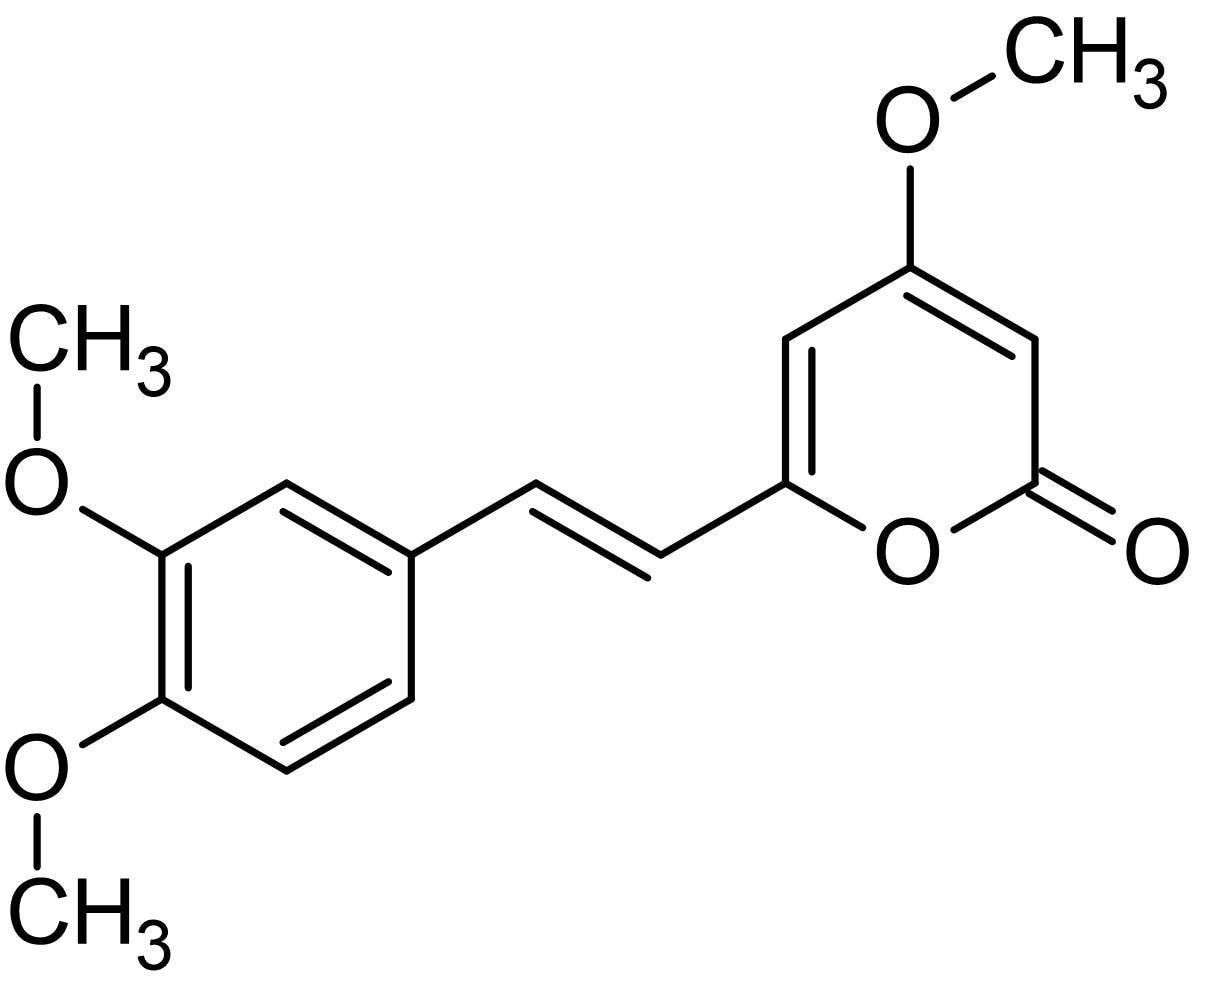 Chemical Structure - 11-Methoxyyangonin, Yangonin metabolite (ab143518)